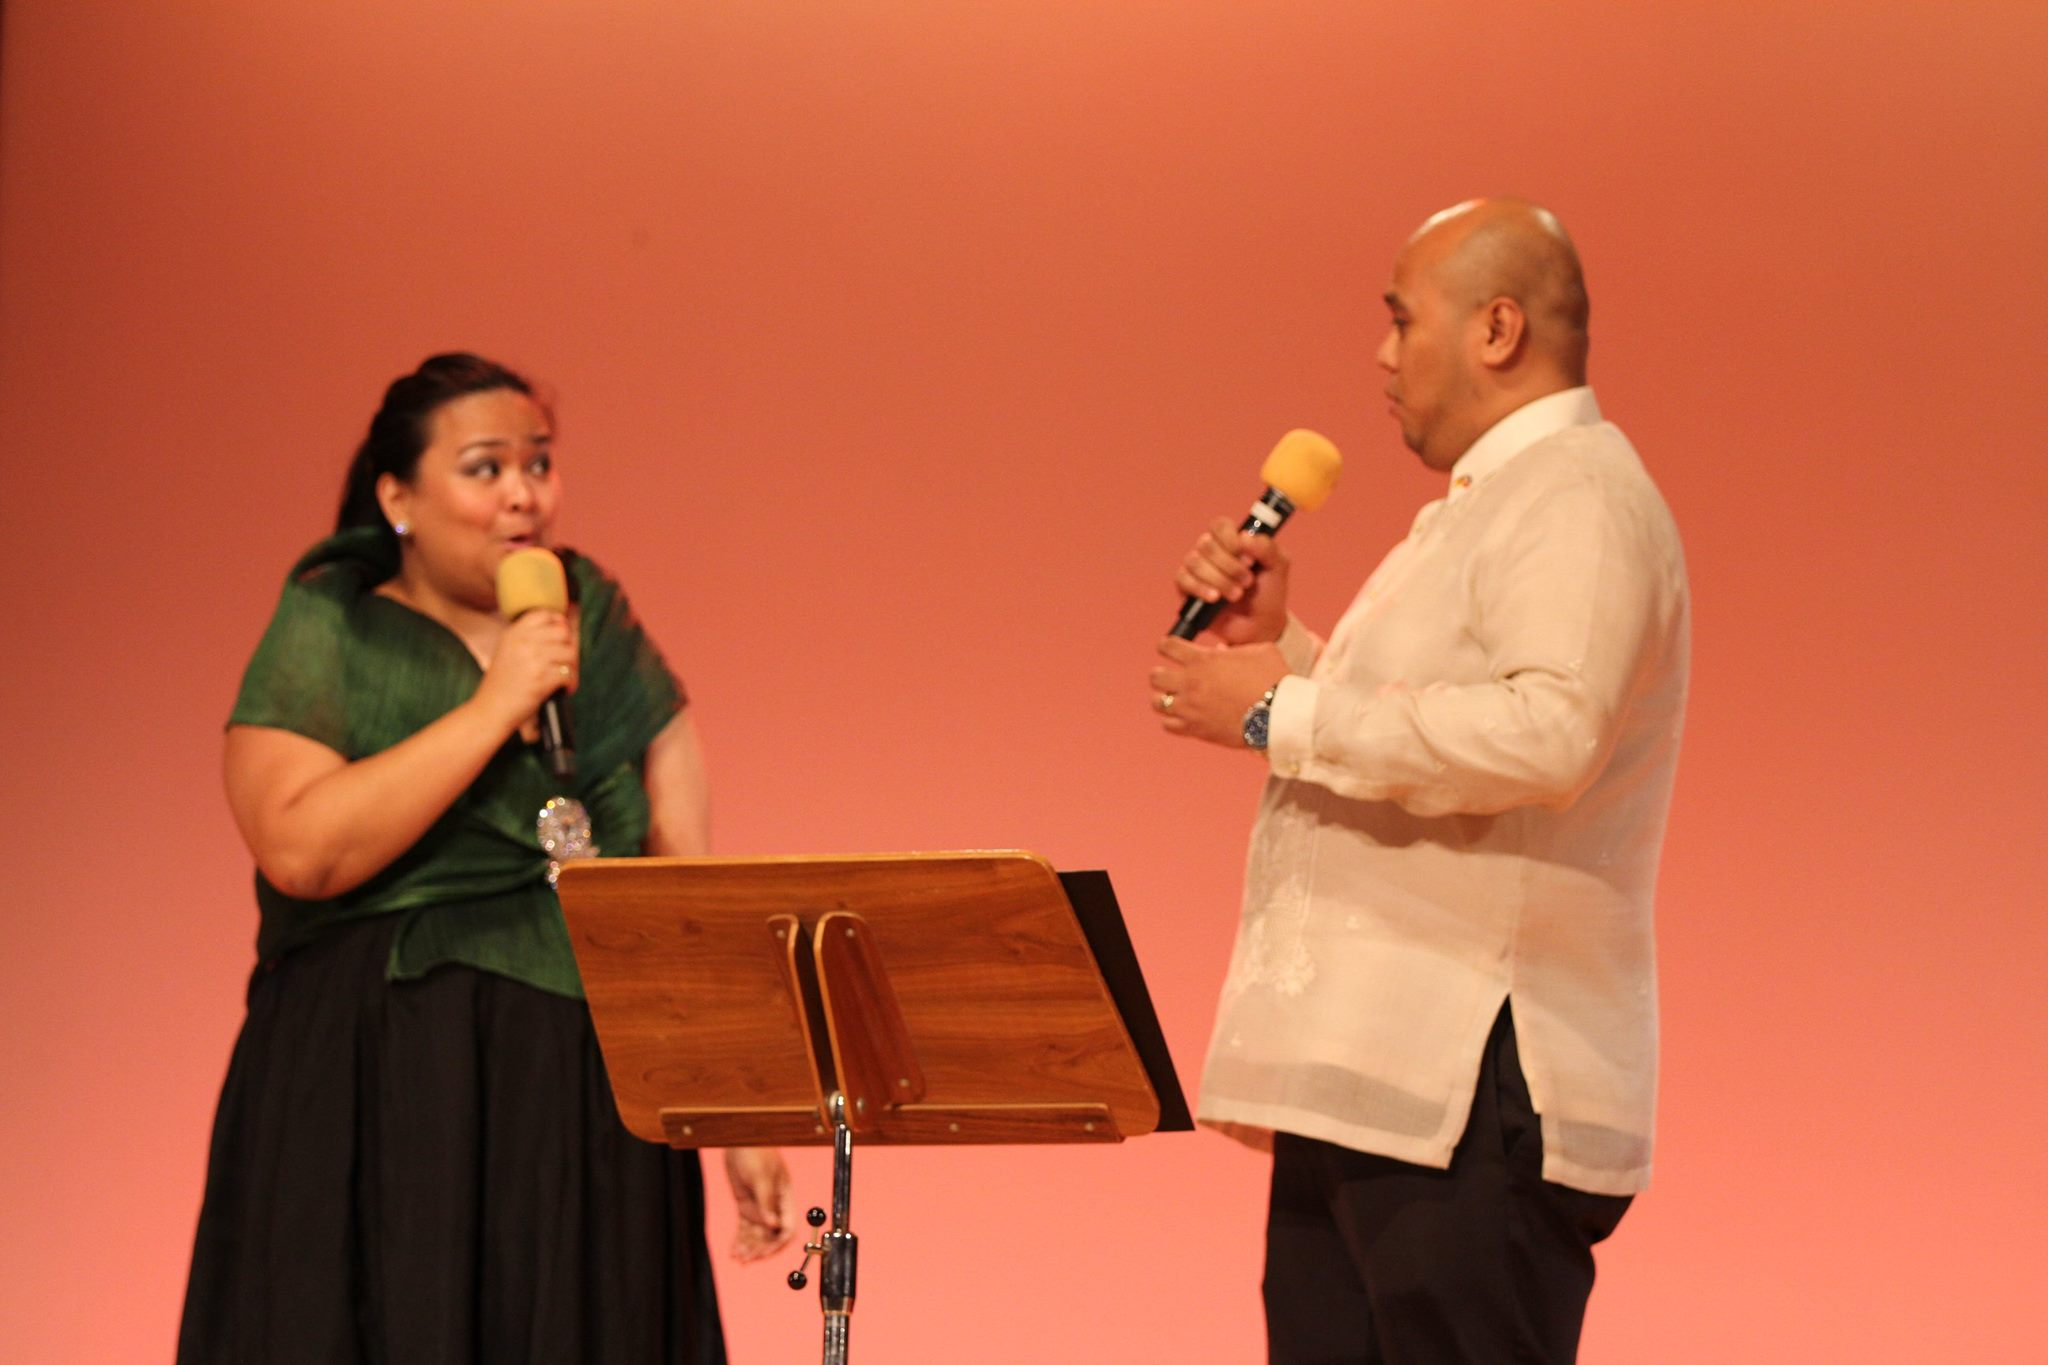 ultural Attaché Mylah Rubio and Jose Mari Rubio serenaded guests with popular Filipino songs